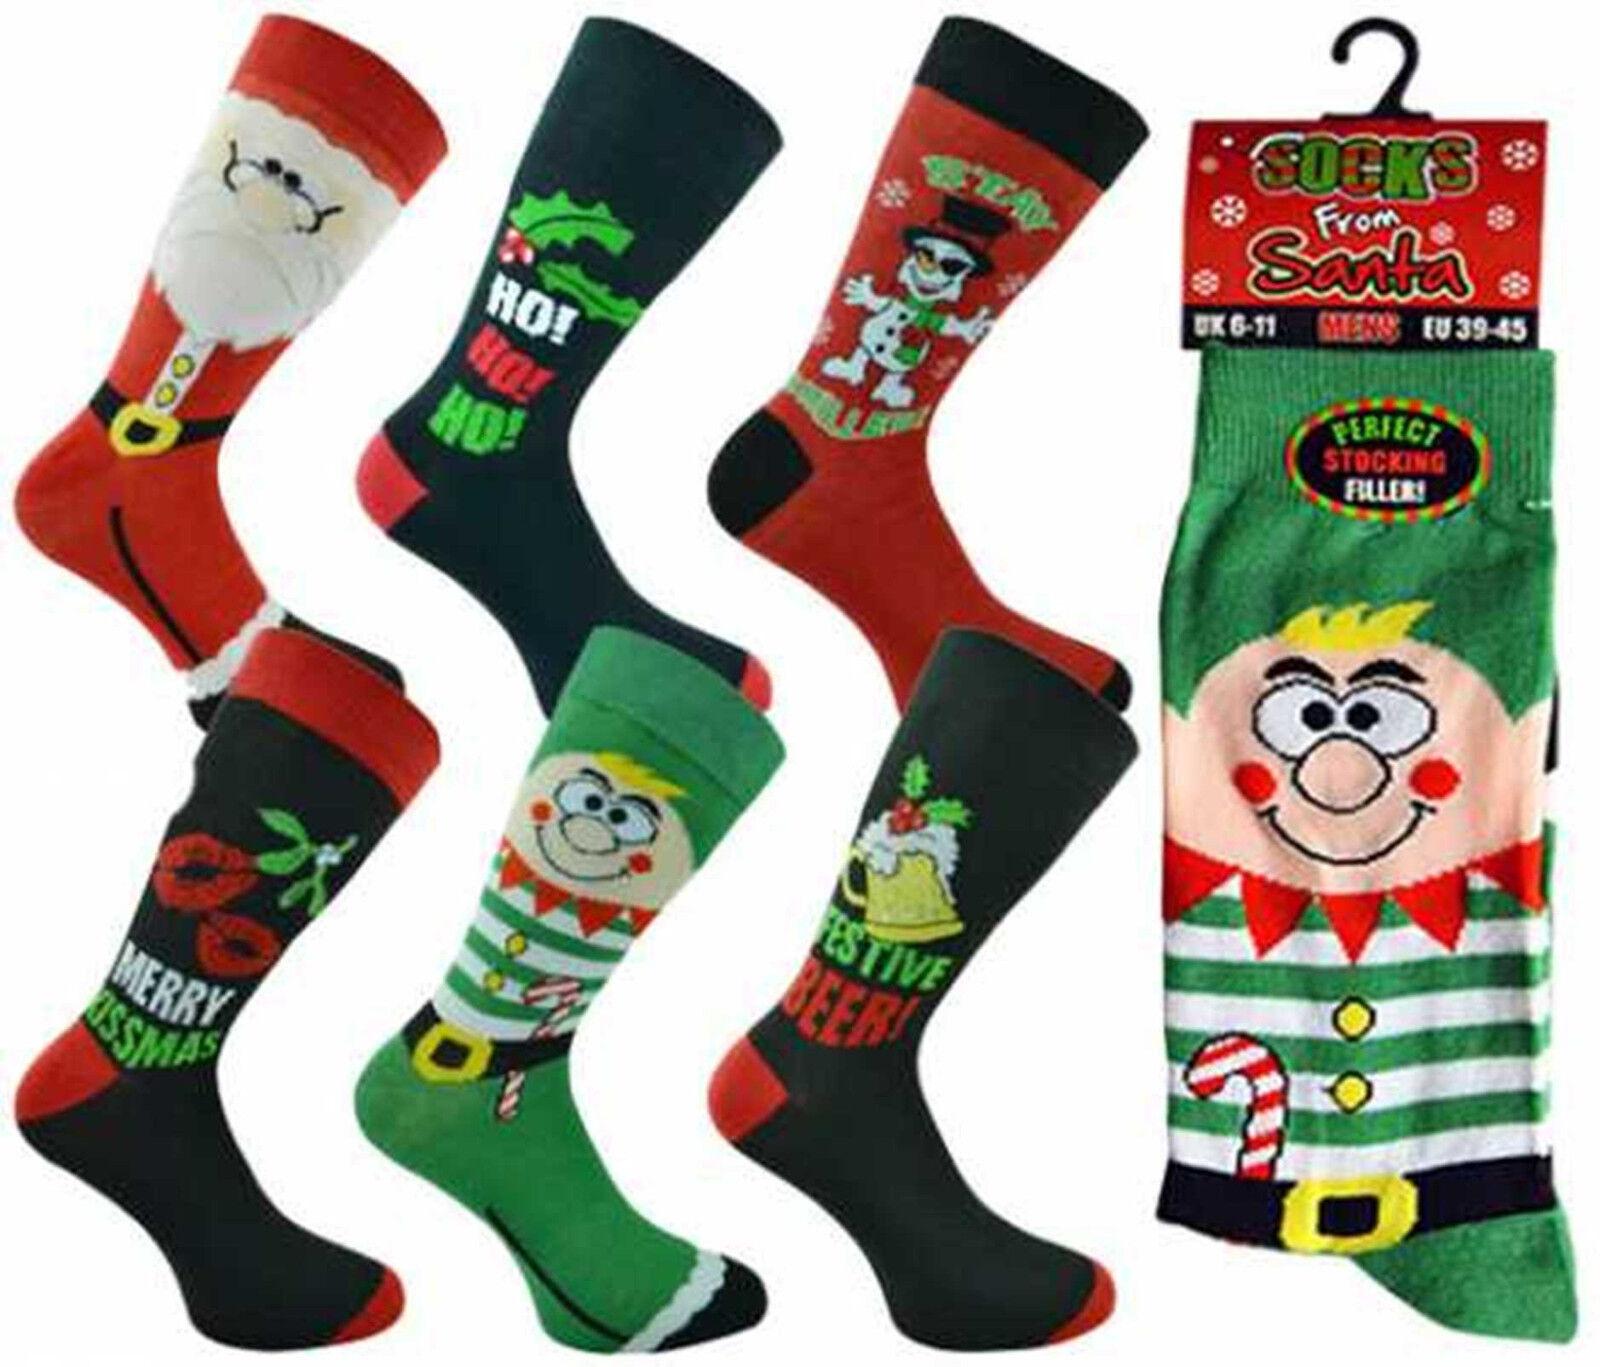 3 Pairs Gents Socks From Santa Festive Christmas Cotton Rich Novelty Xmas Socks